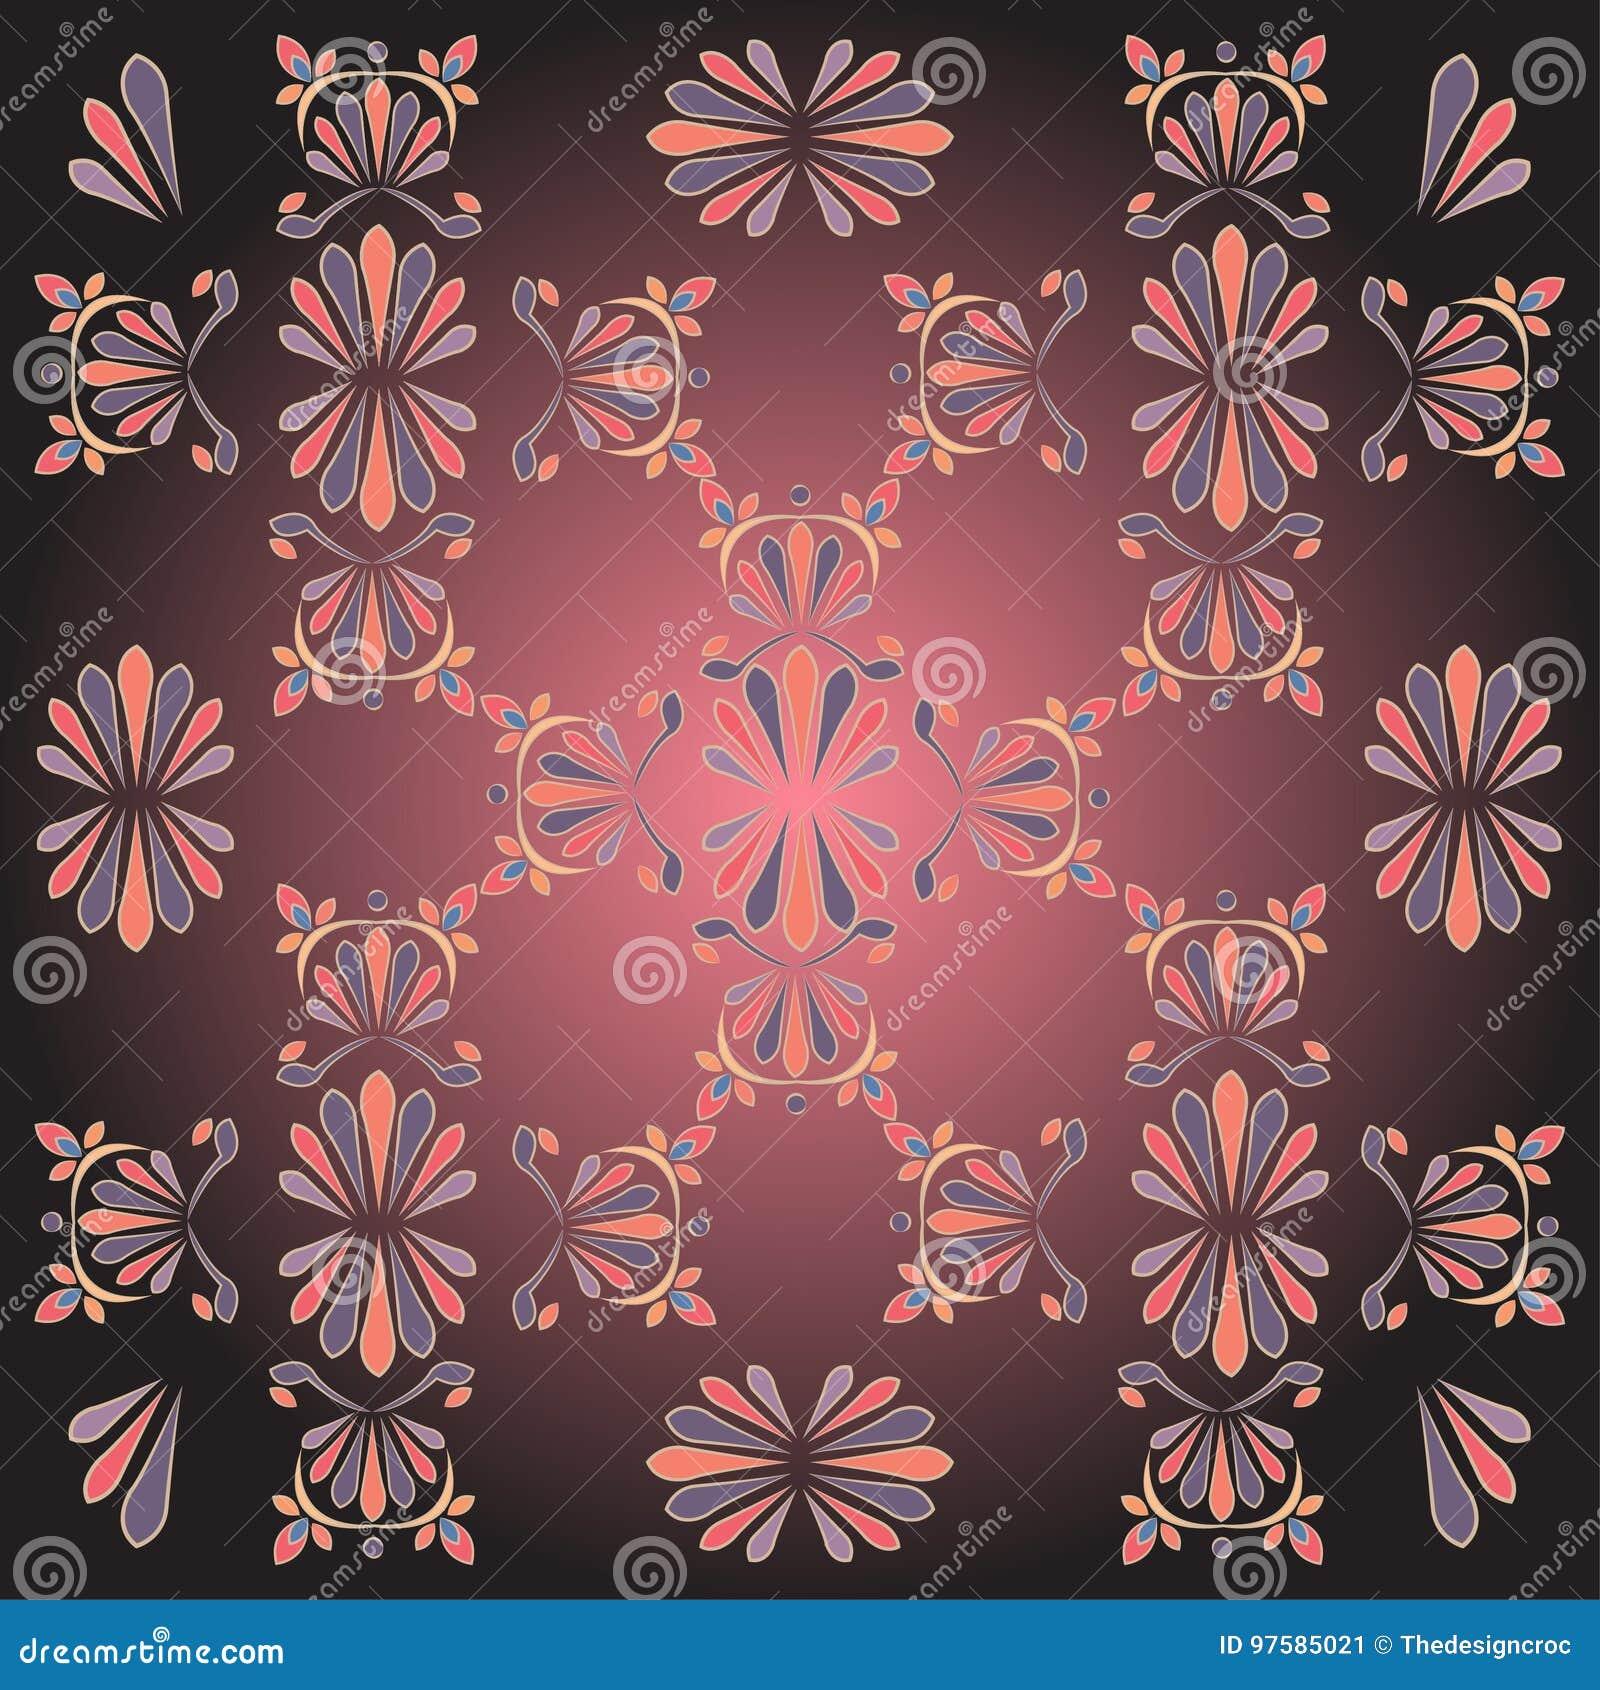 Black Pink Grey Floral Designs Motif Background Stock Vector ...